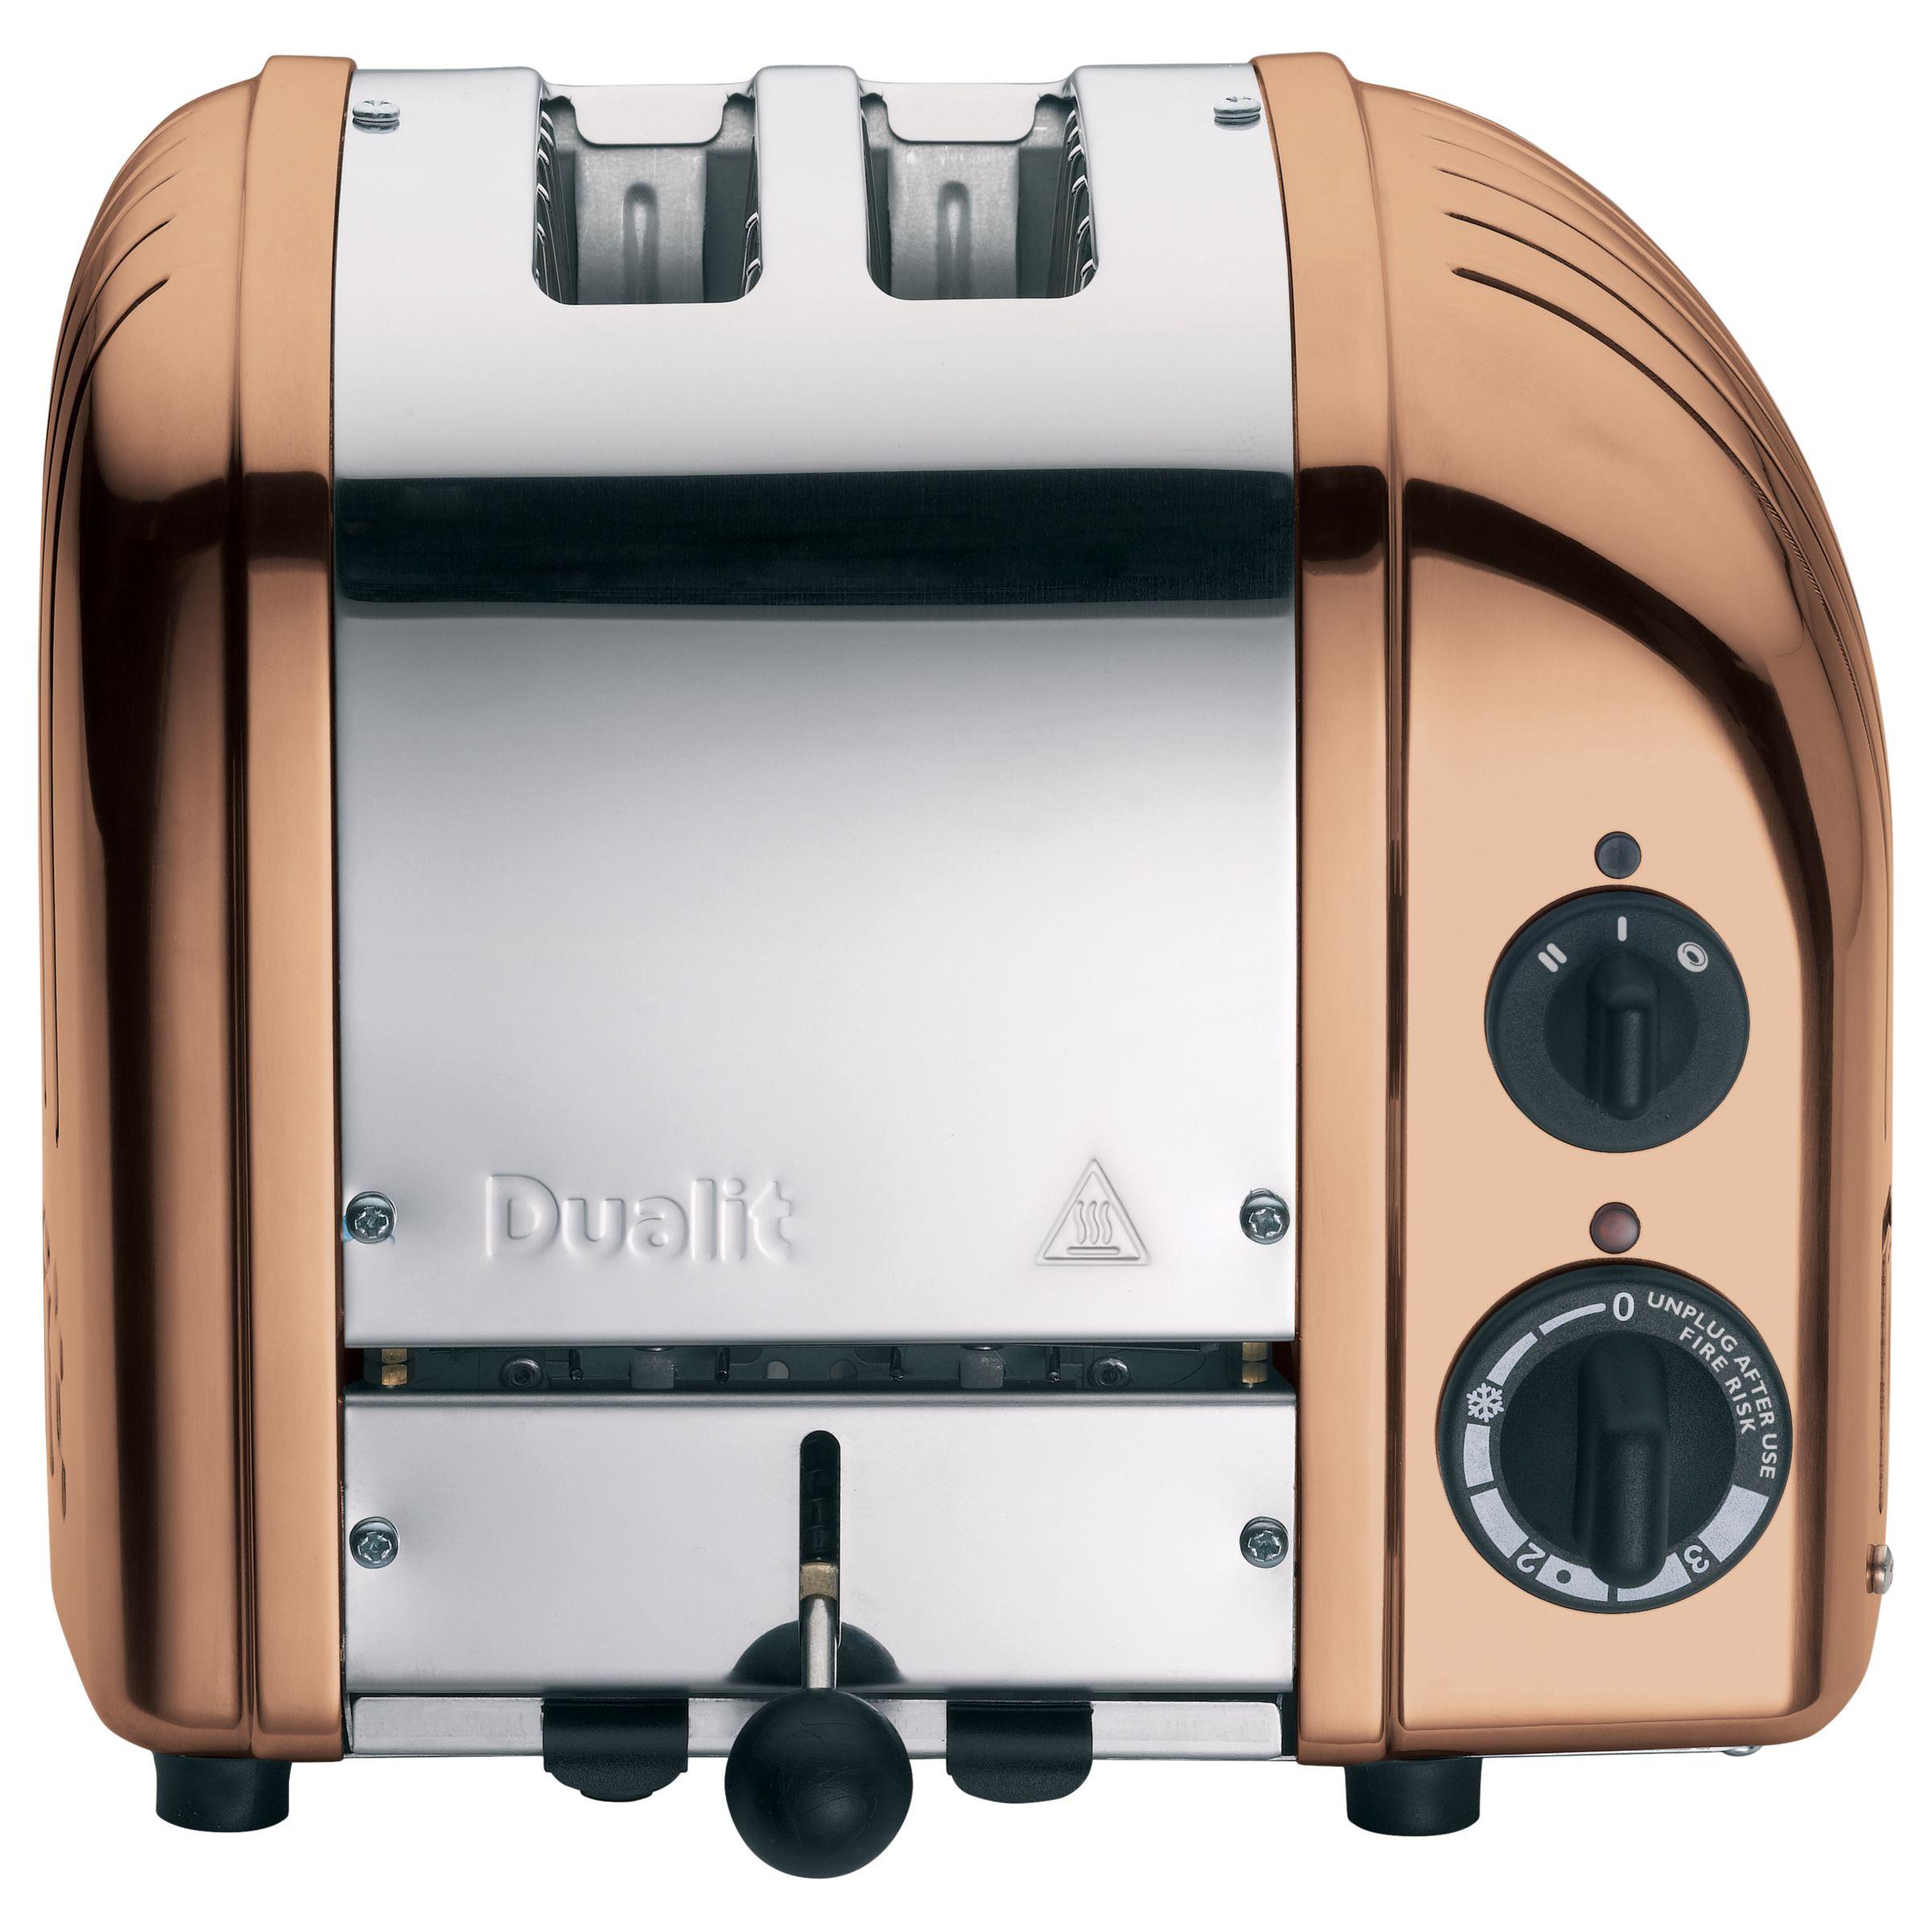 Dualit Dualit NewGen 2-Slice Toaster